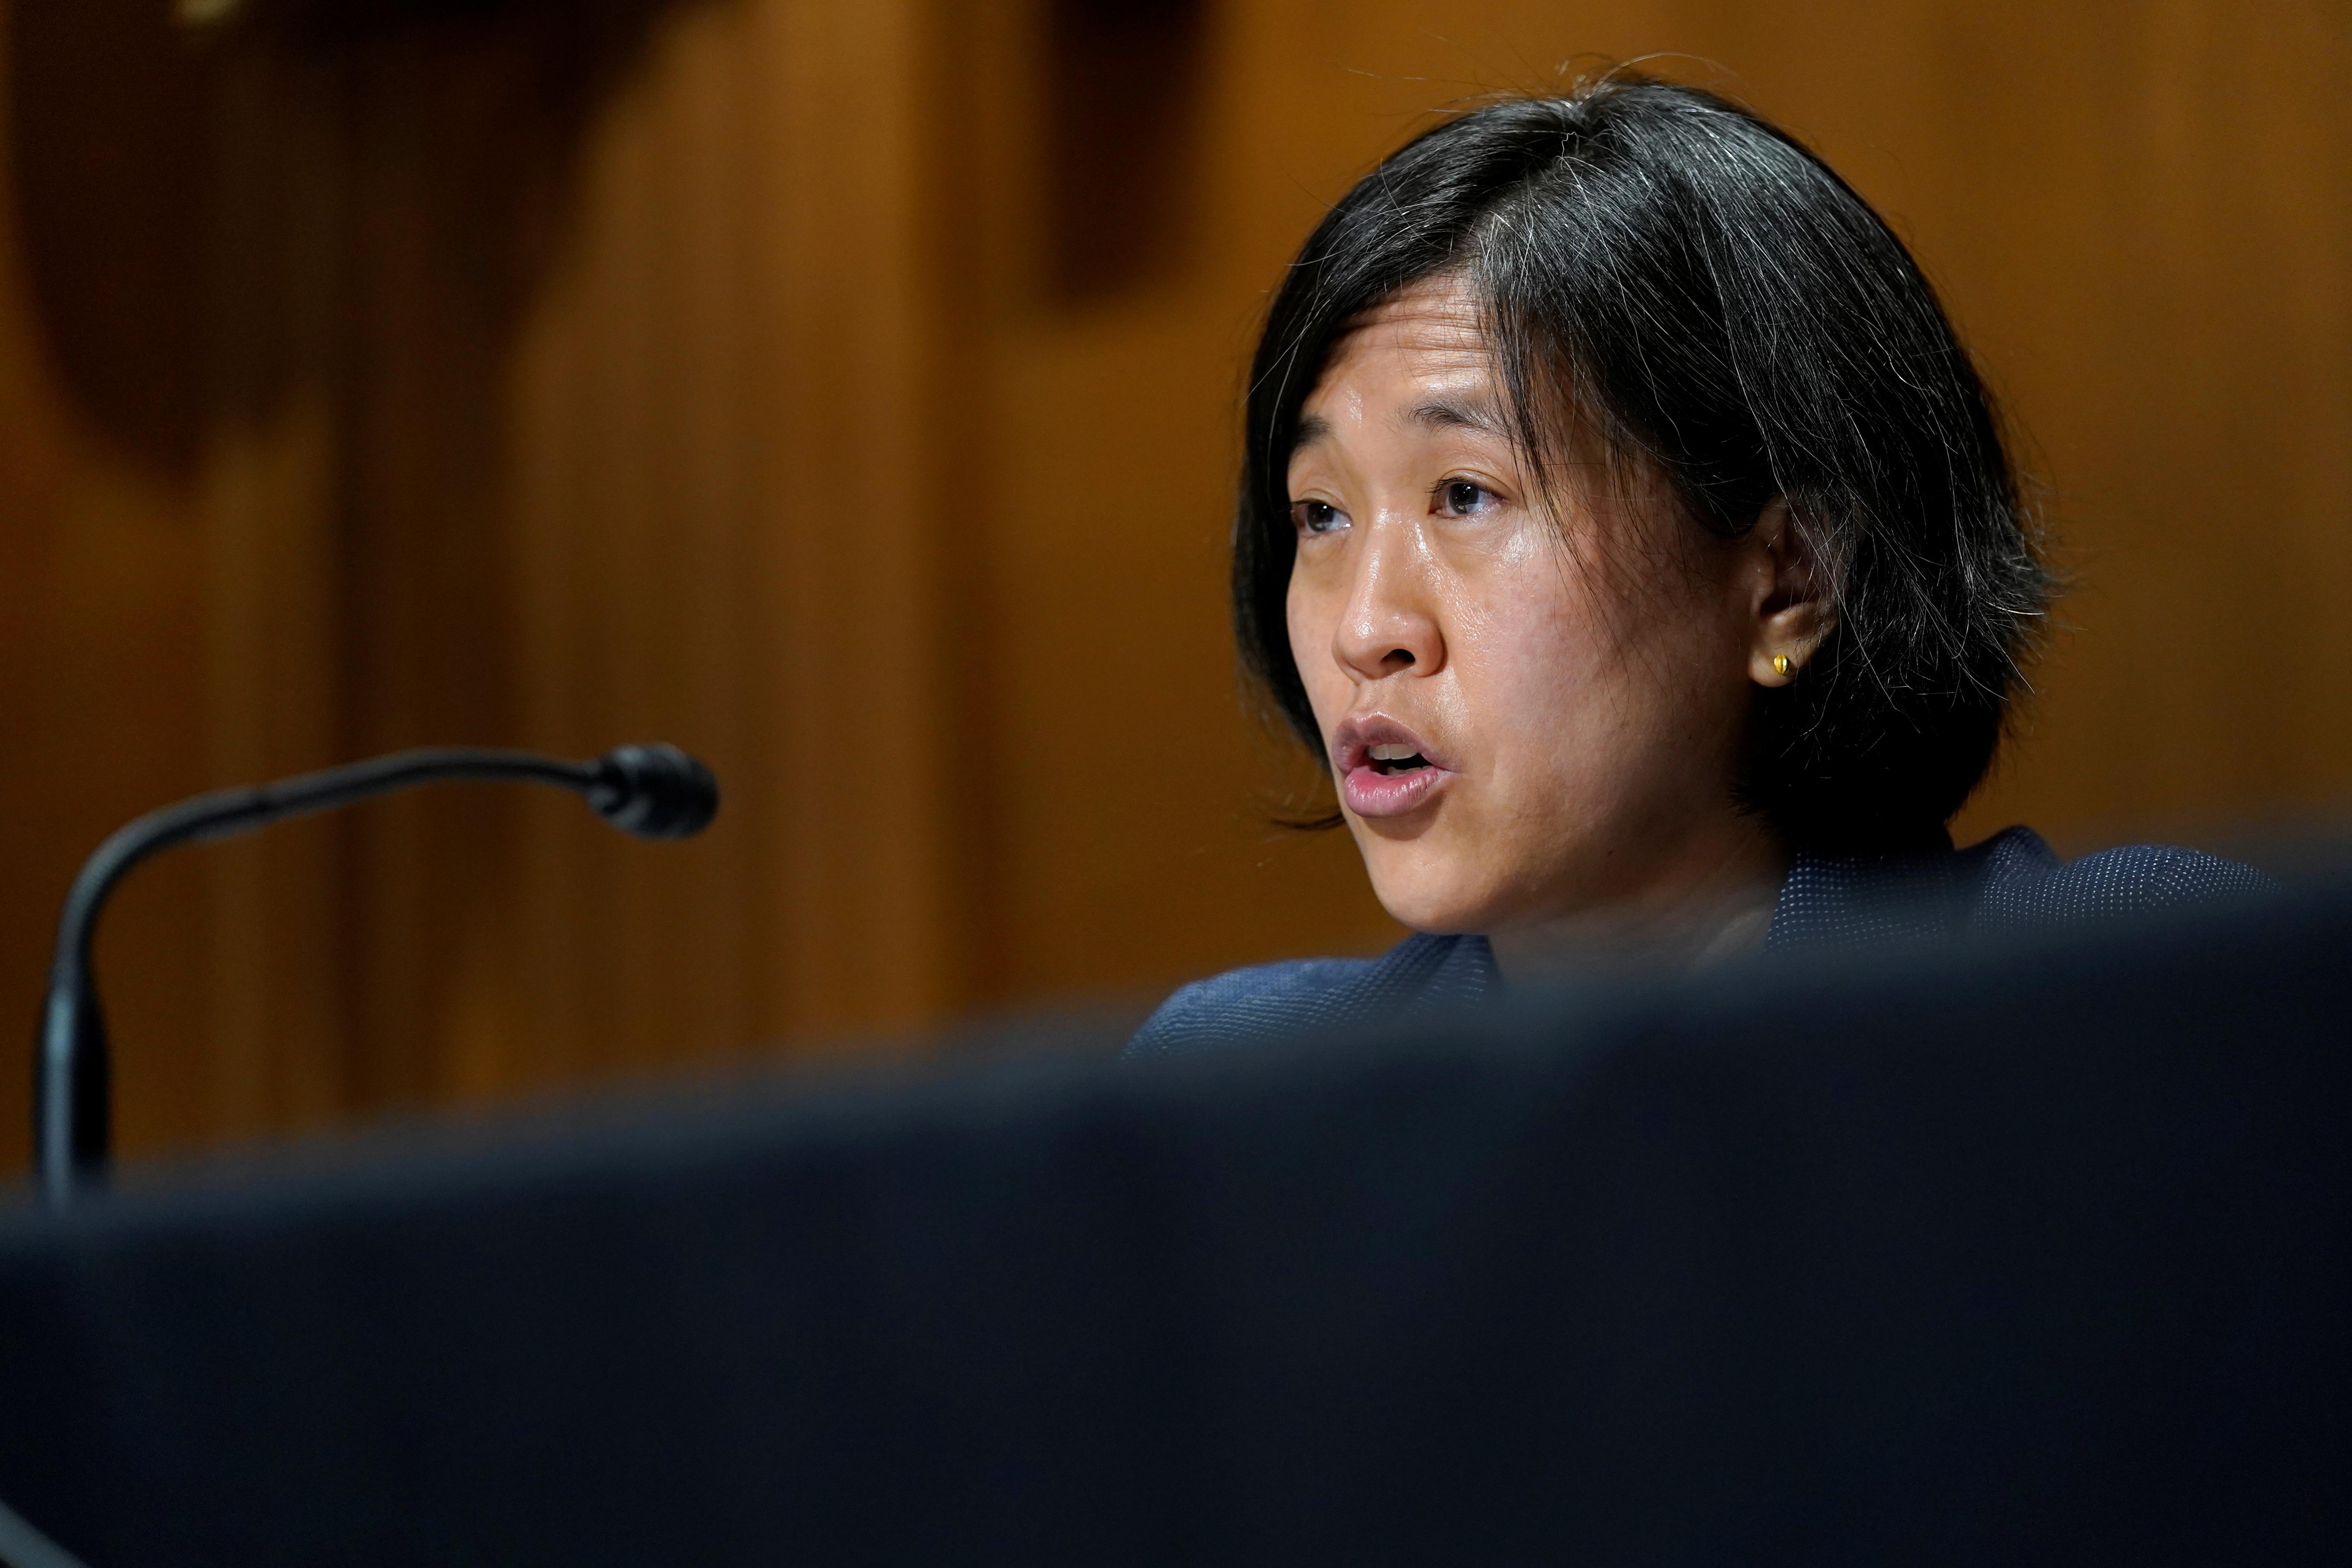 U.S. Trade Representative Katherine Tai testifies before the Senate Finance Committee on Capitol Hill in Washington, U.S., May 12, 2021.  Susan Walsh/Pool via REUTERS